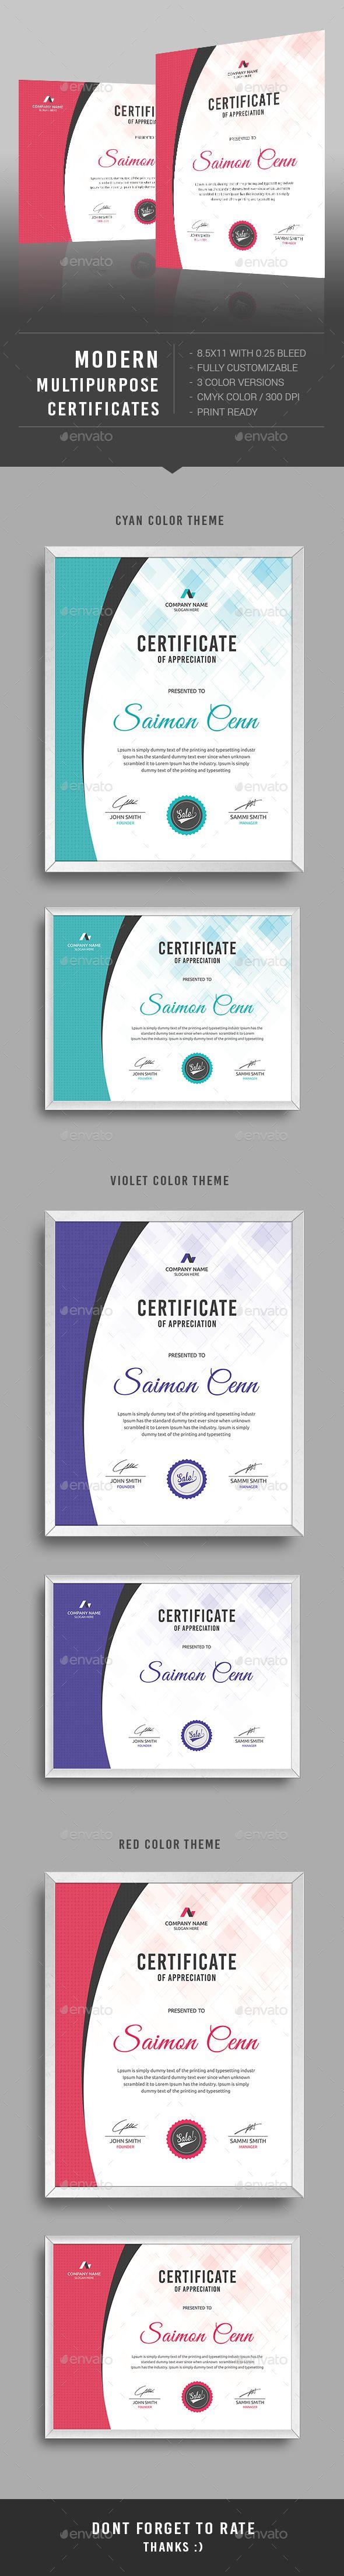 Certificate | Grafik-Layouts, Zertifikat und Layout